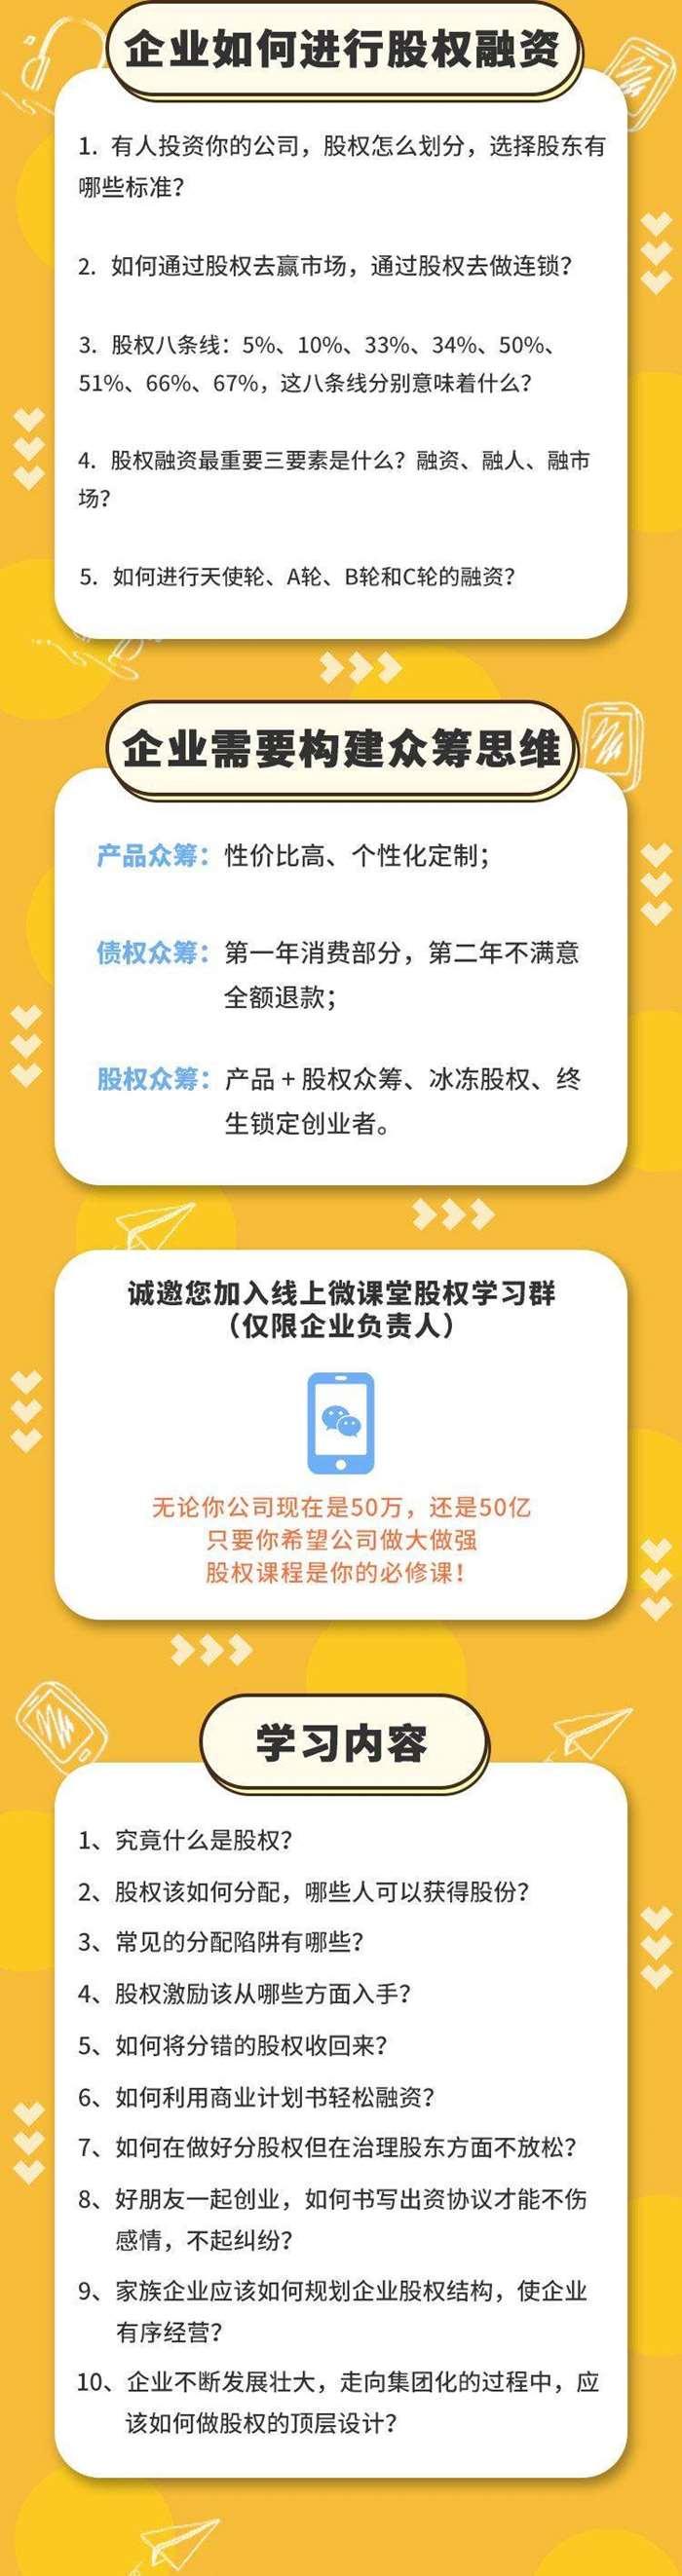 http://www.huodongxing.com/file/20190516/2443422520256/443423668375016.jpg